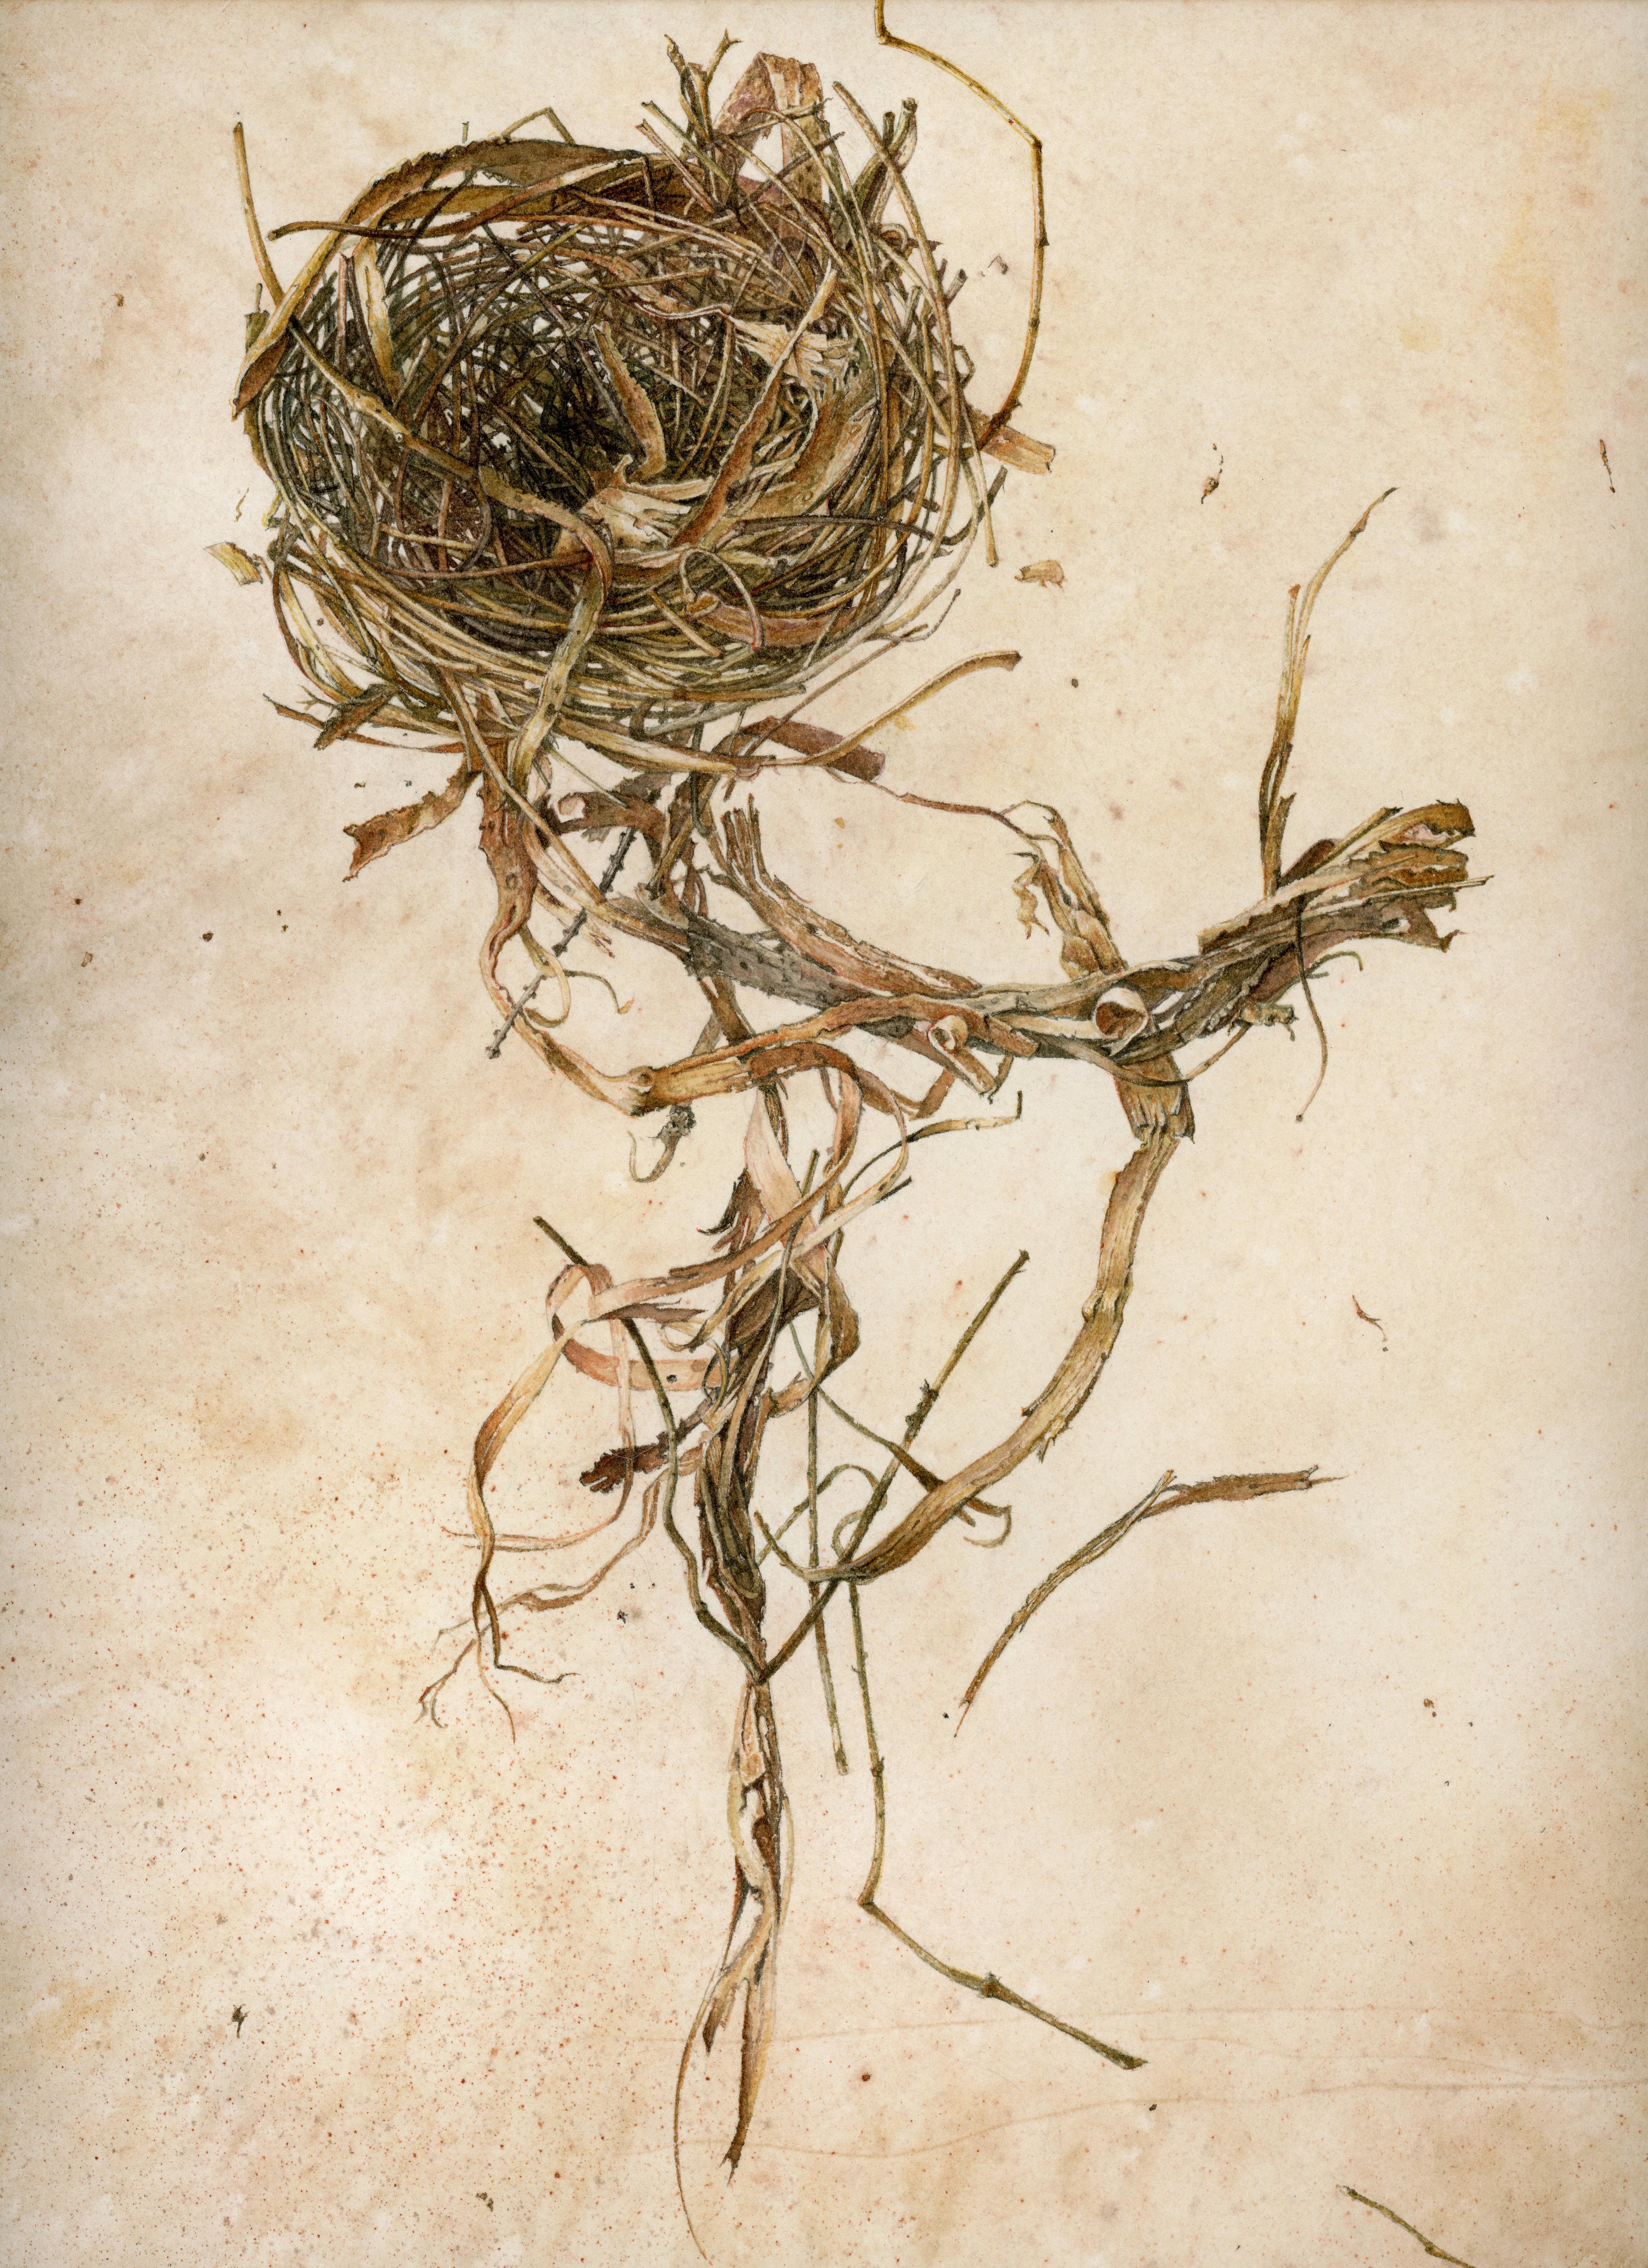 Nest: Gravity